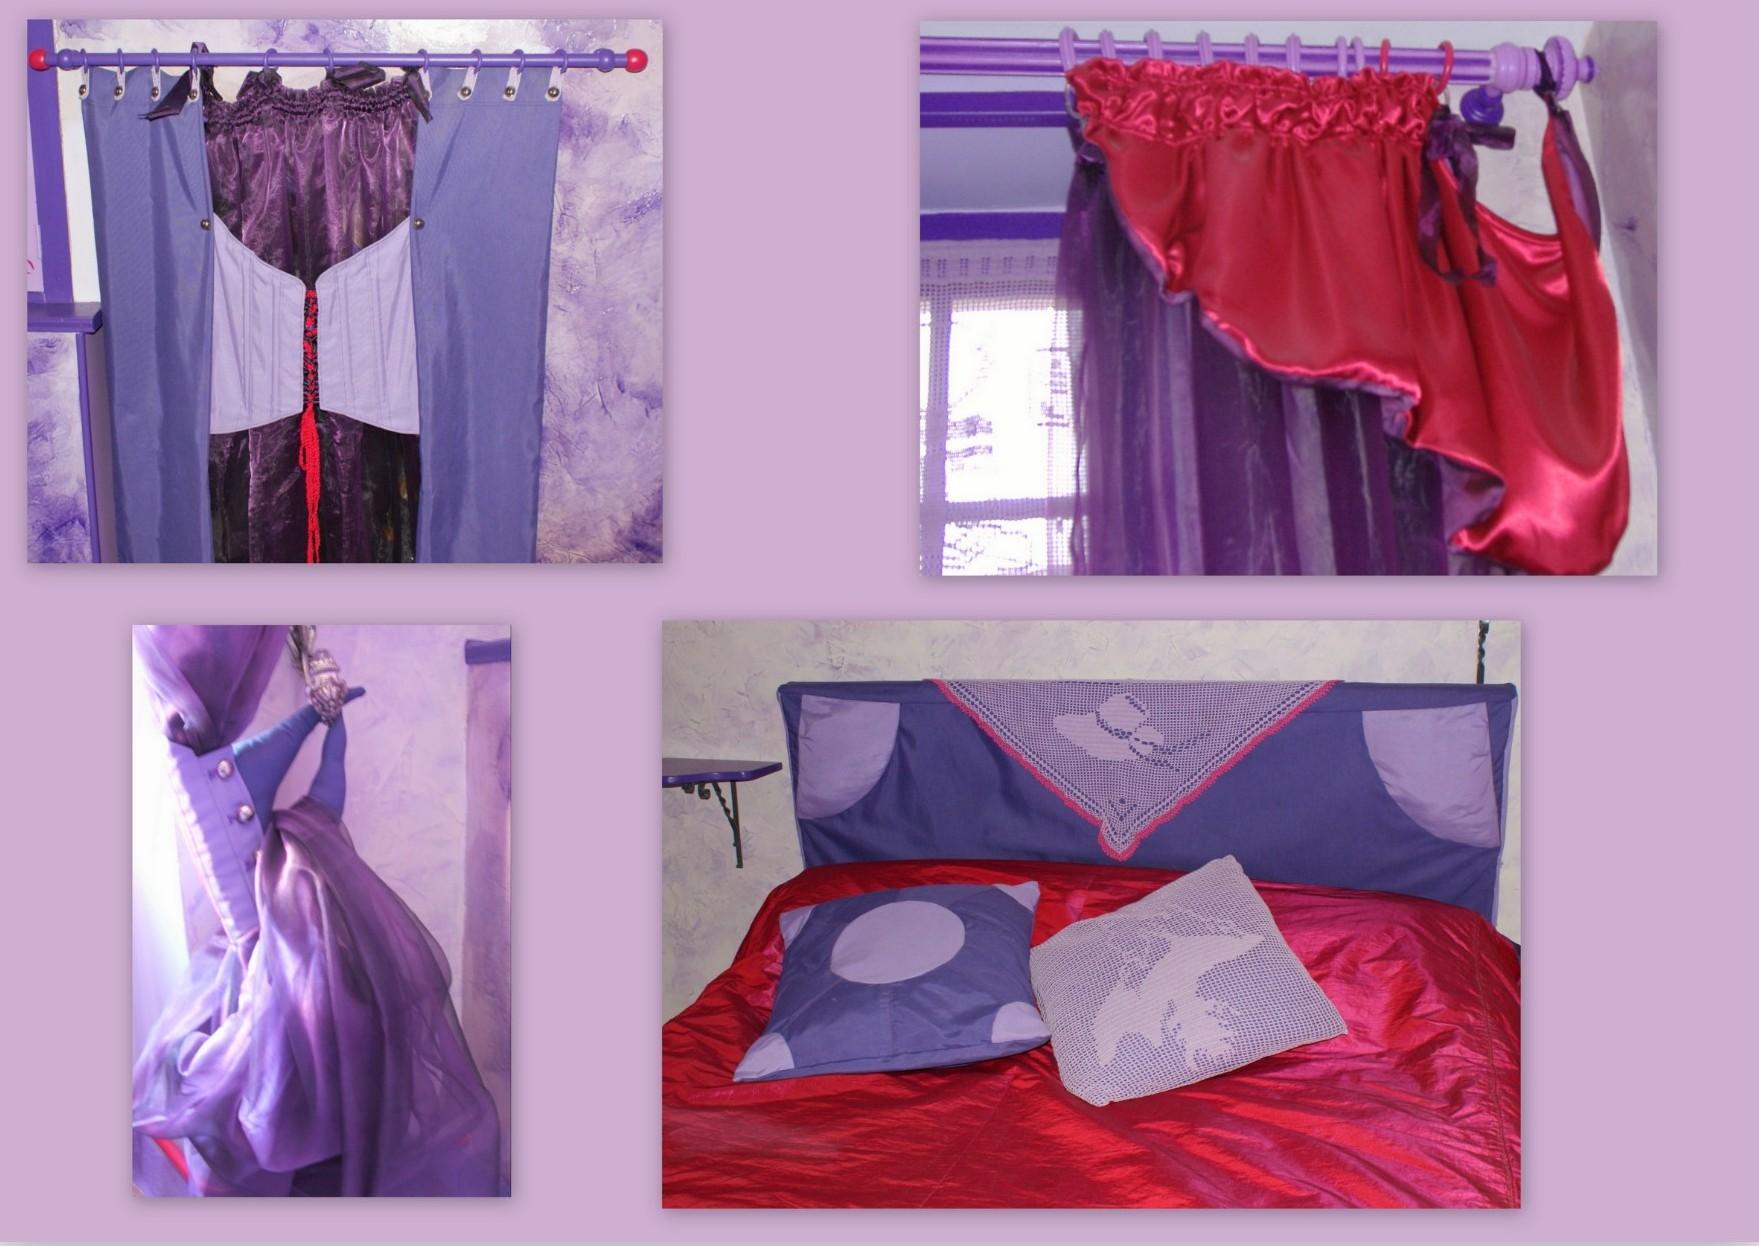 Ambiance rose / violette